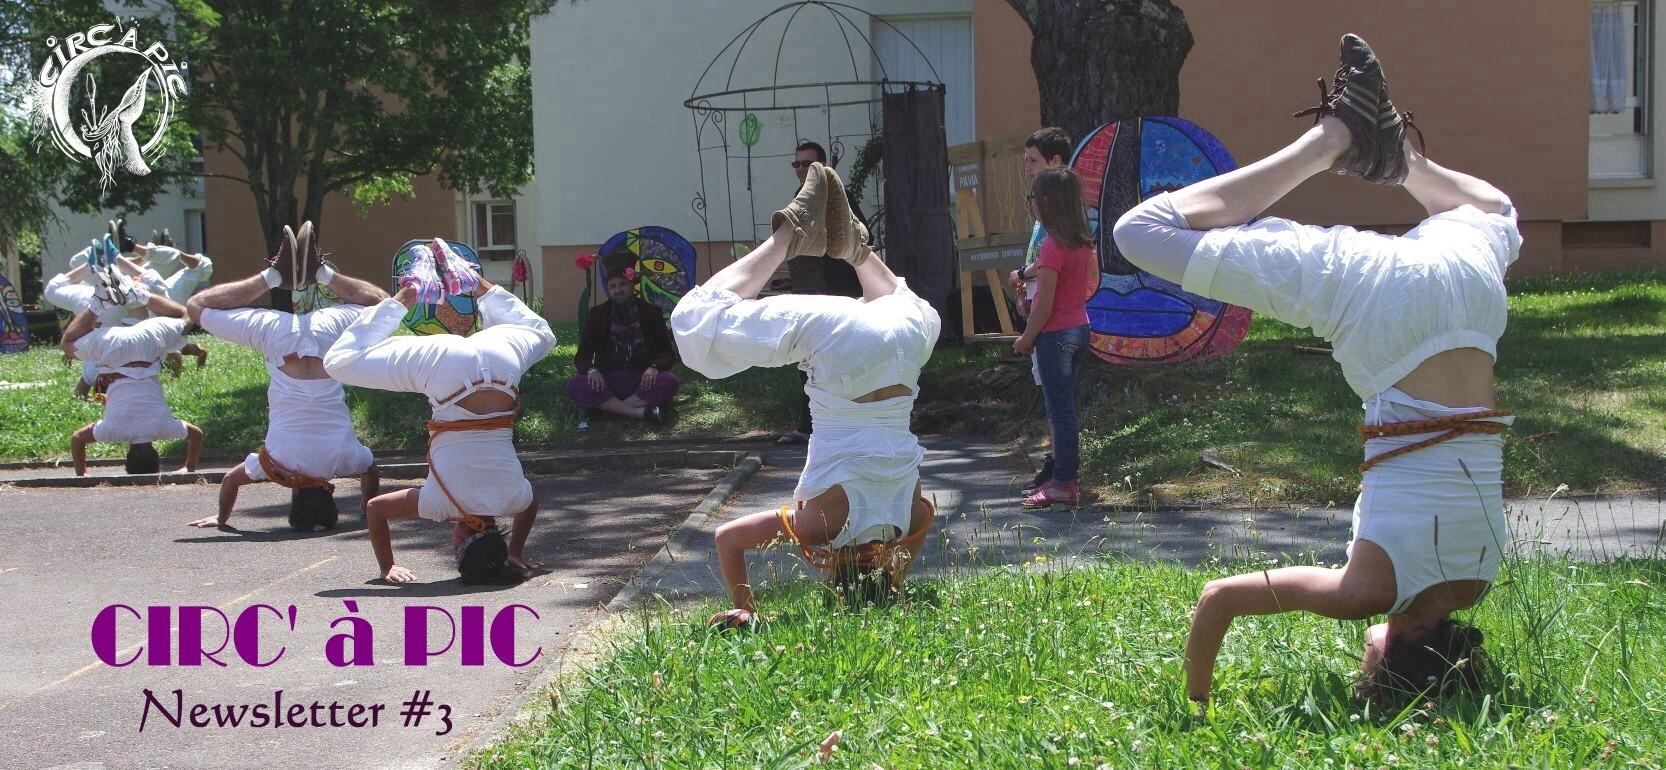 cirque-circ-a-pic-newsletter-3b